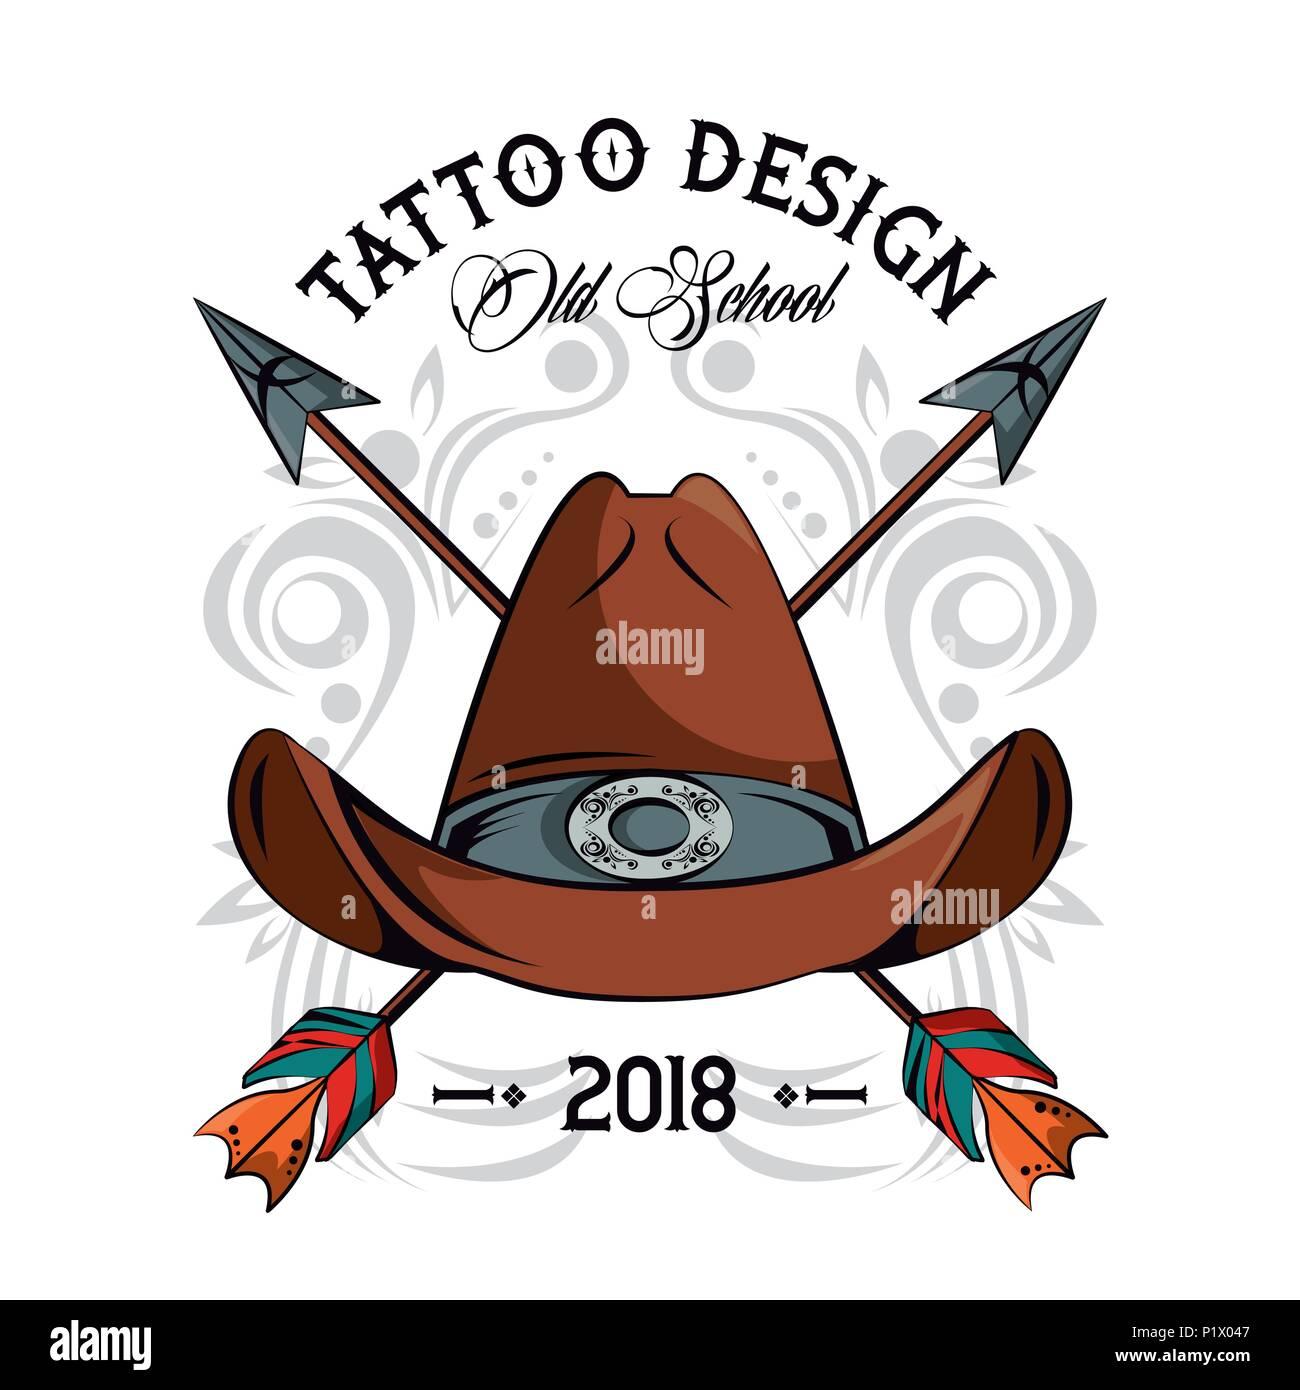 Tattoo studio design Stock Vector